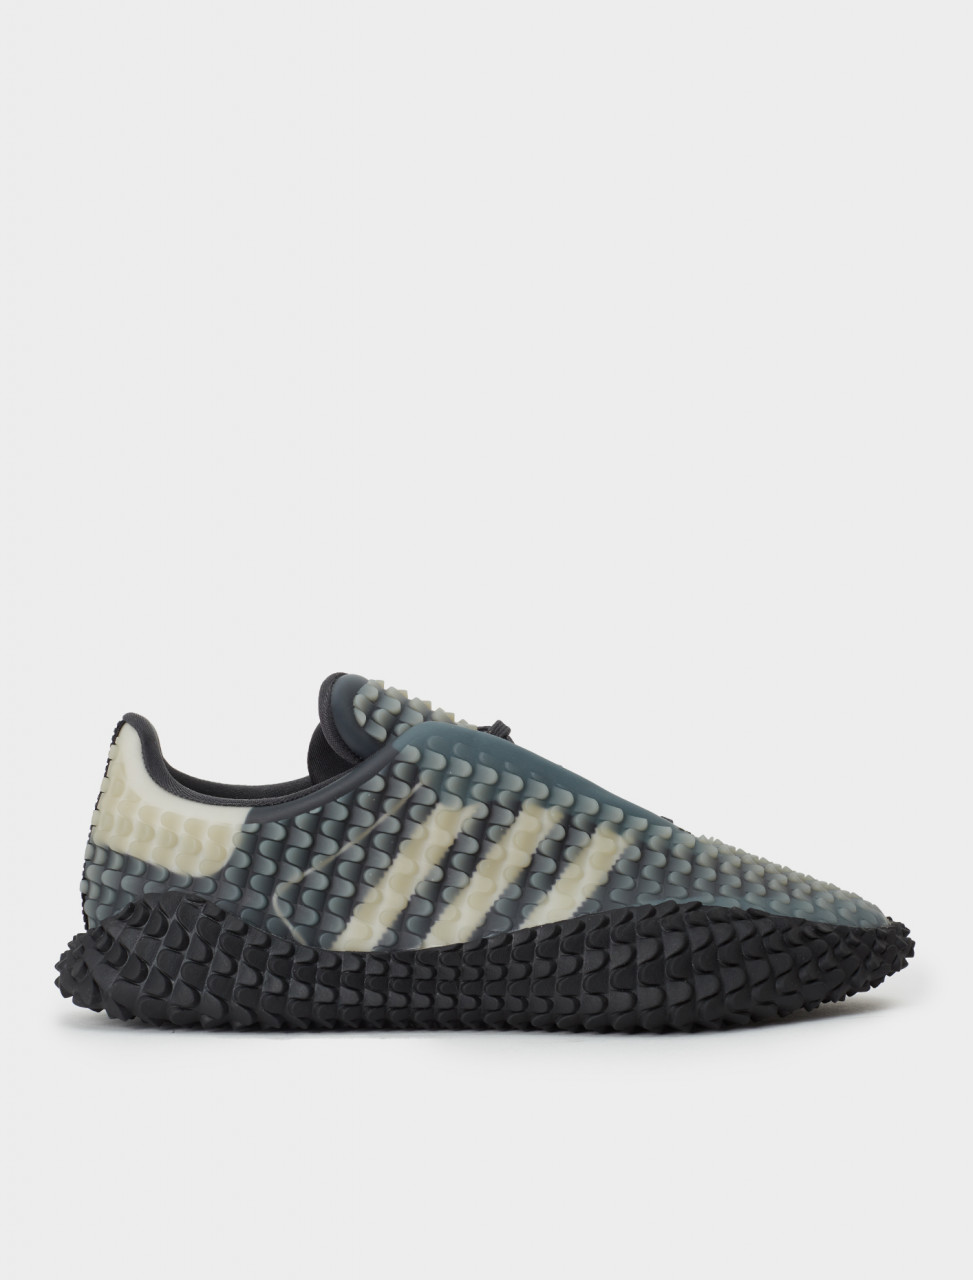 Adidas x Craig Green GRADDFA AKH Sneaker in Carbon